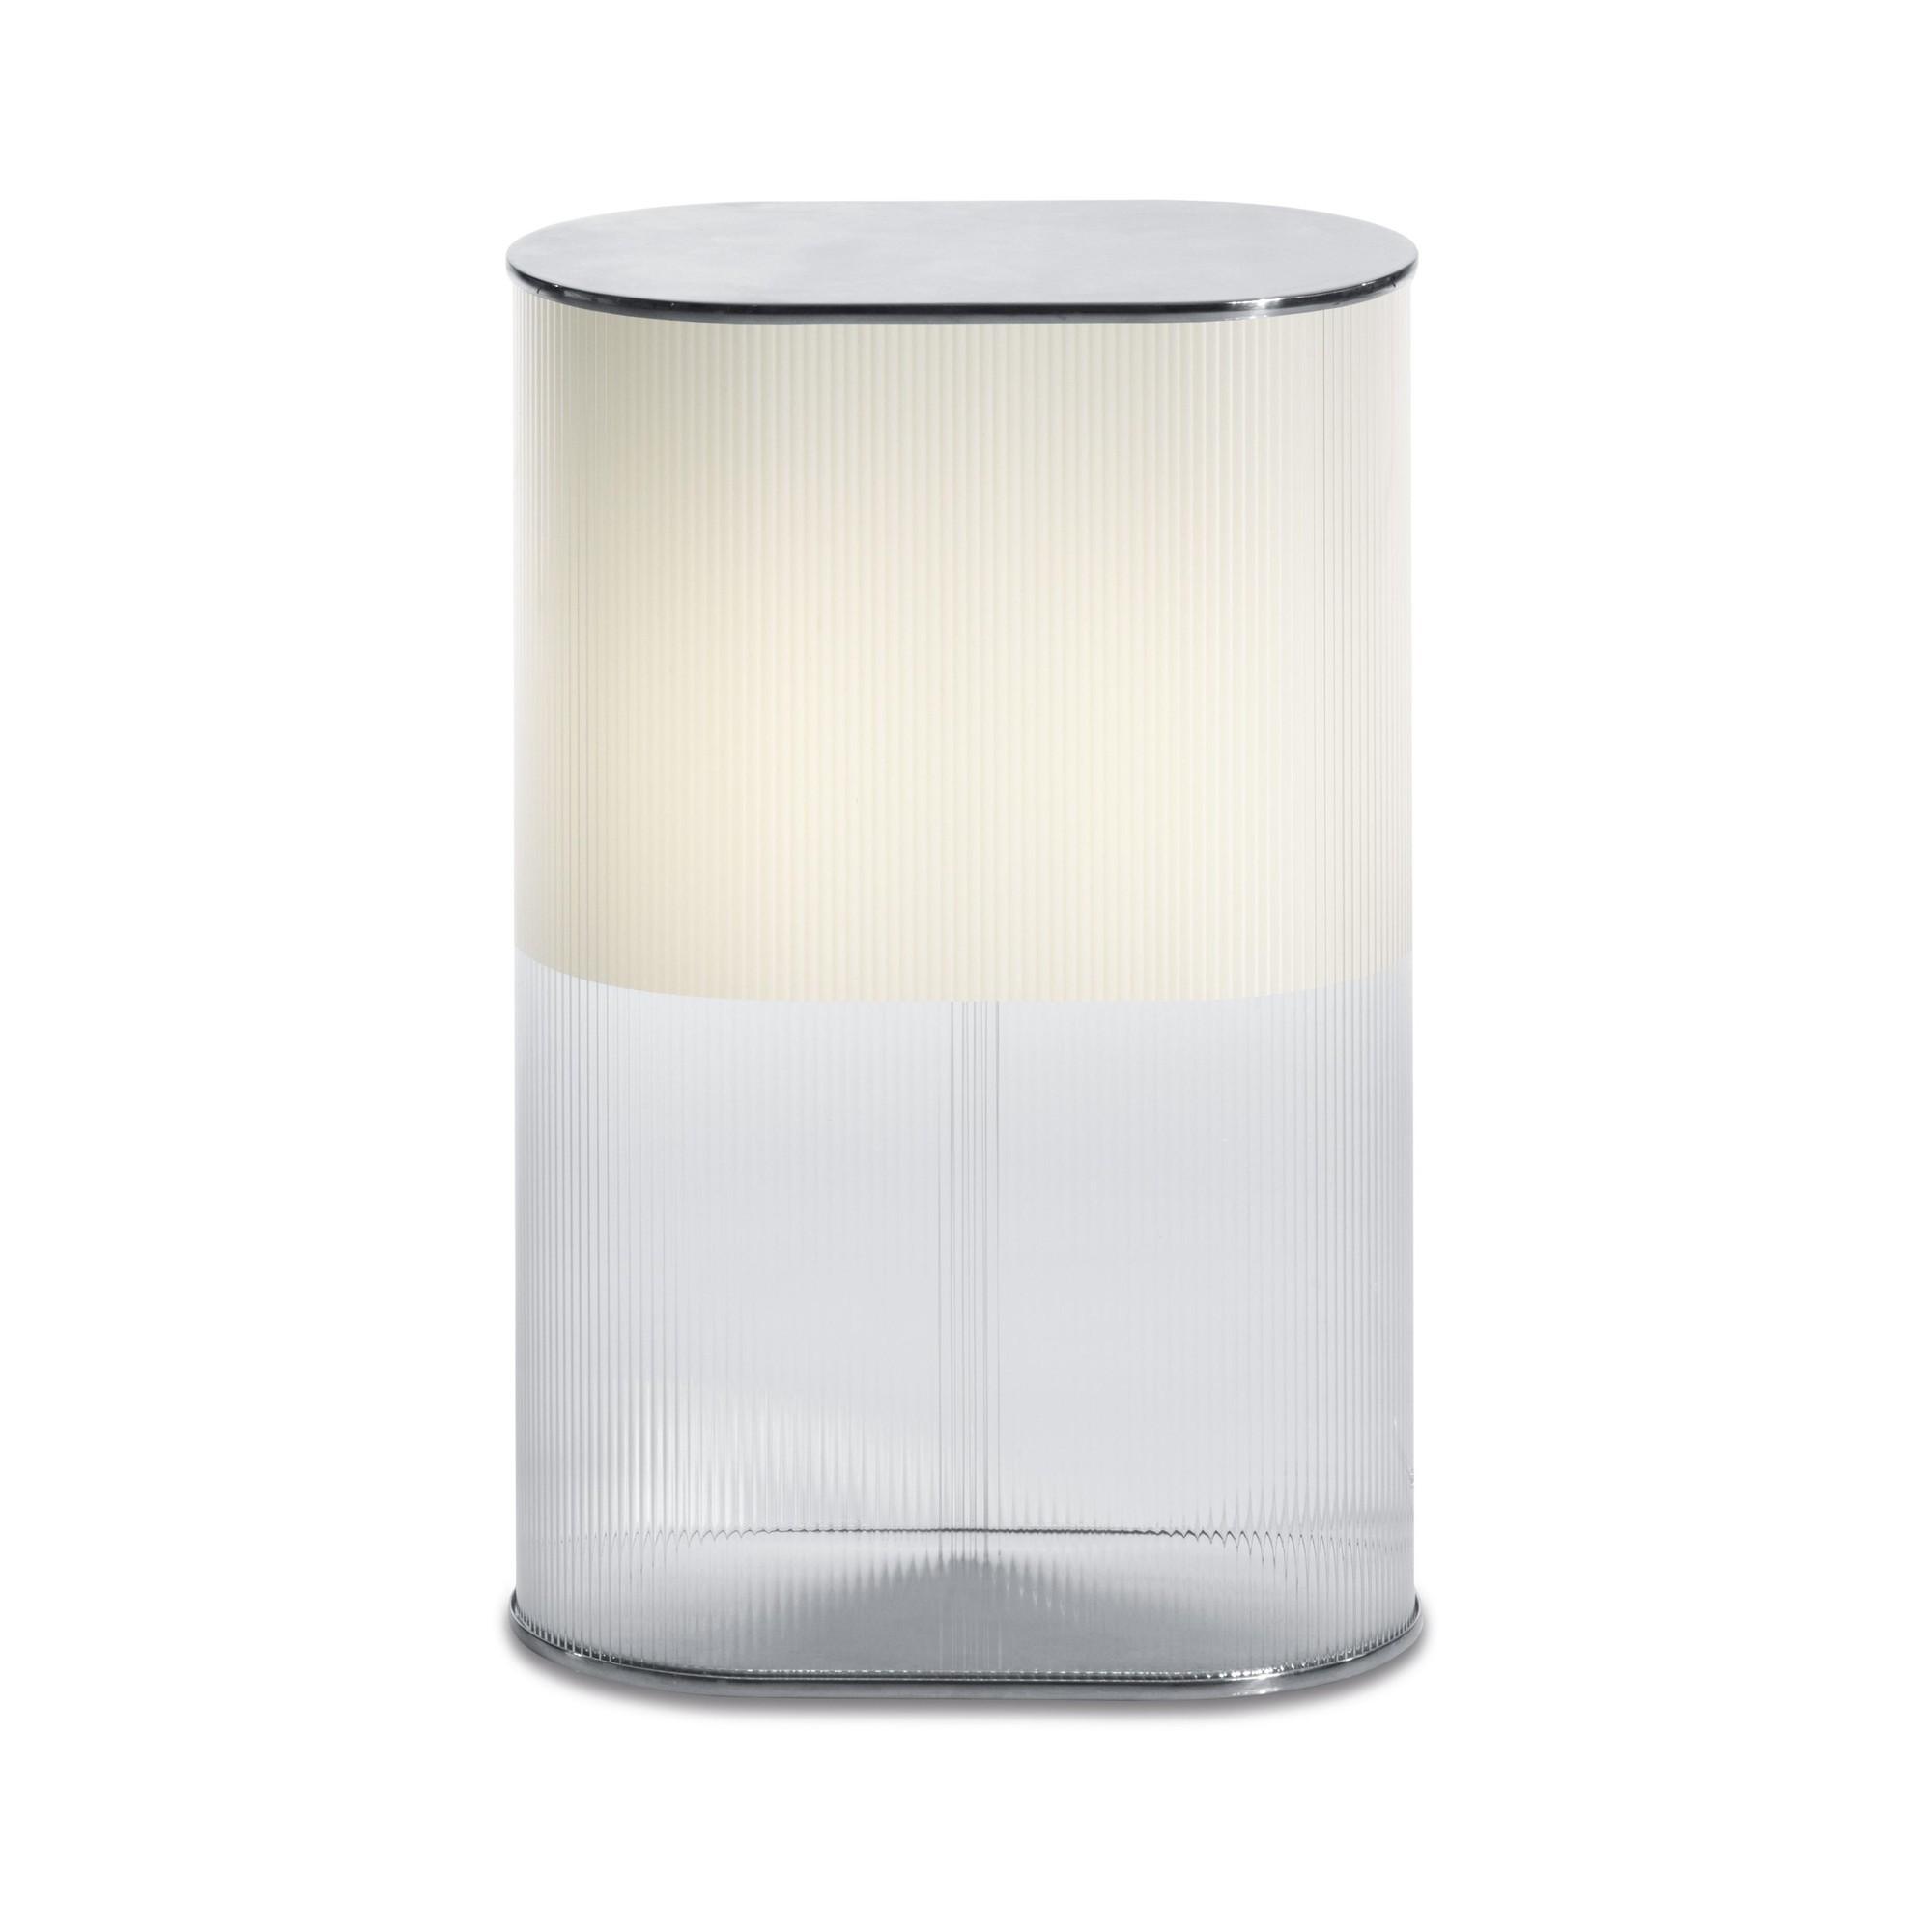 Lampe Caboche Patricia Urquiola leia table lamp